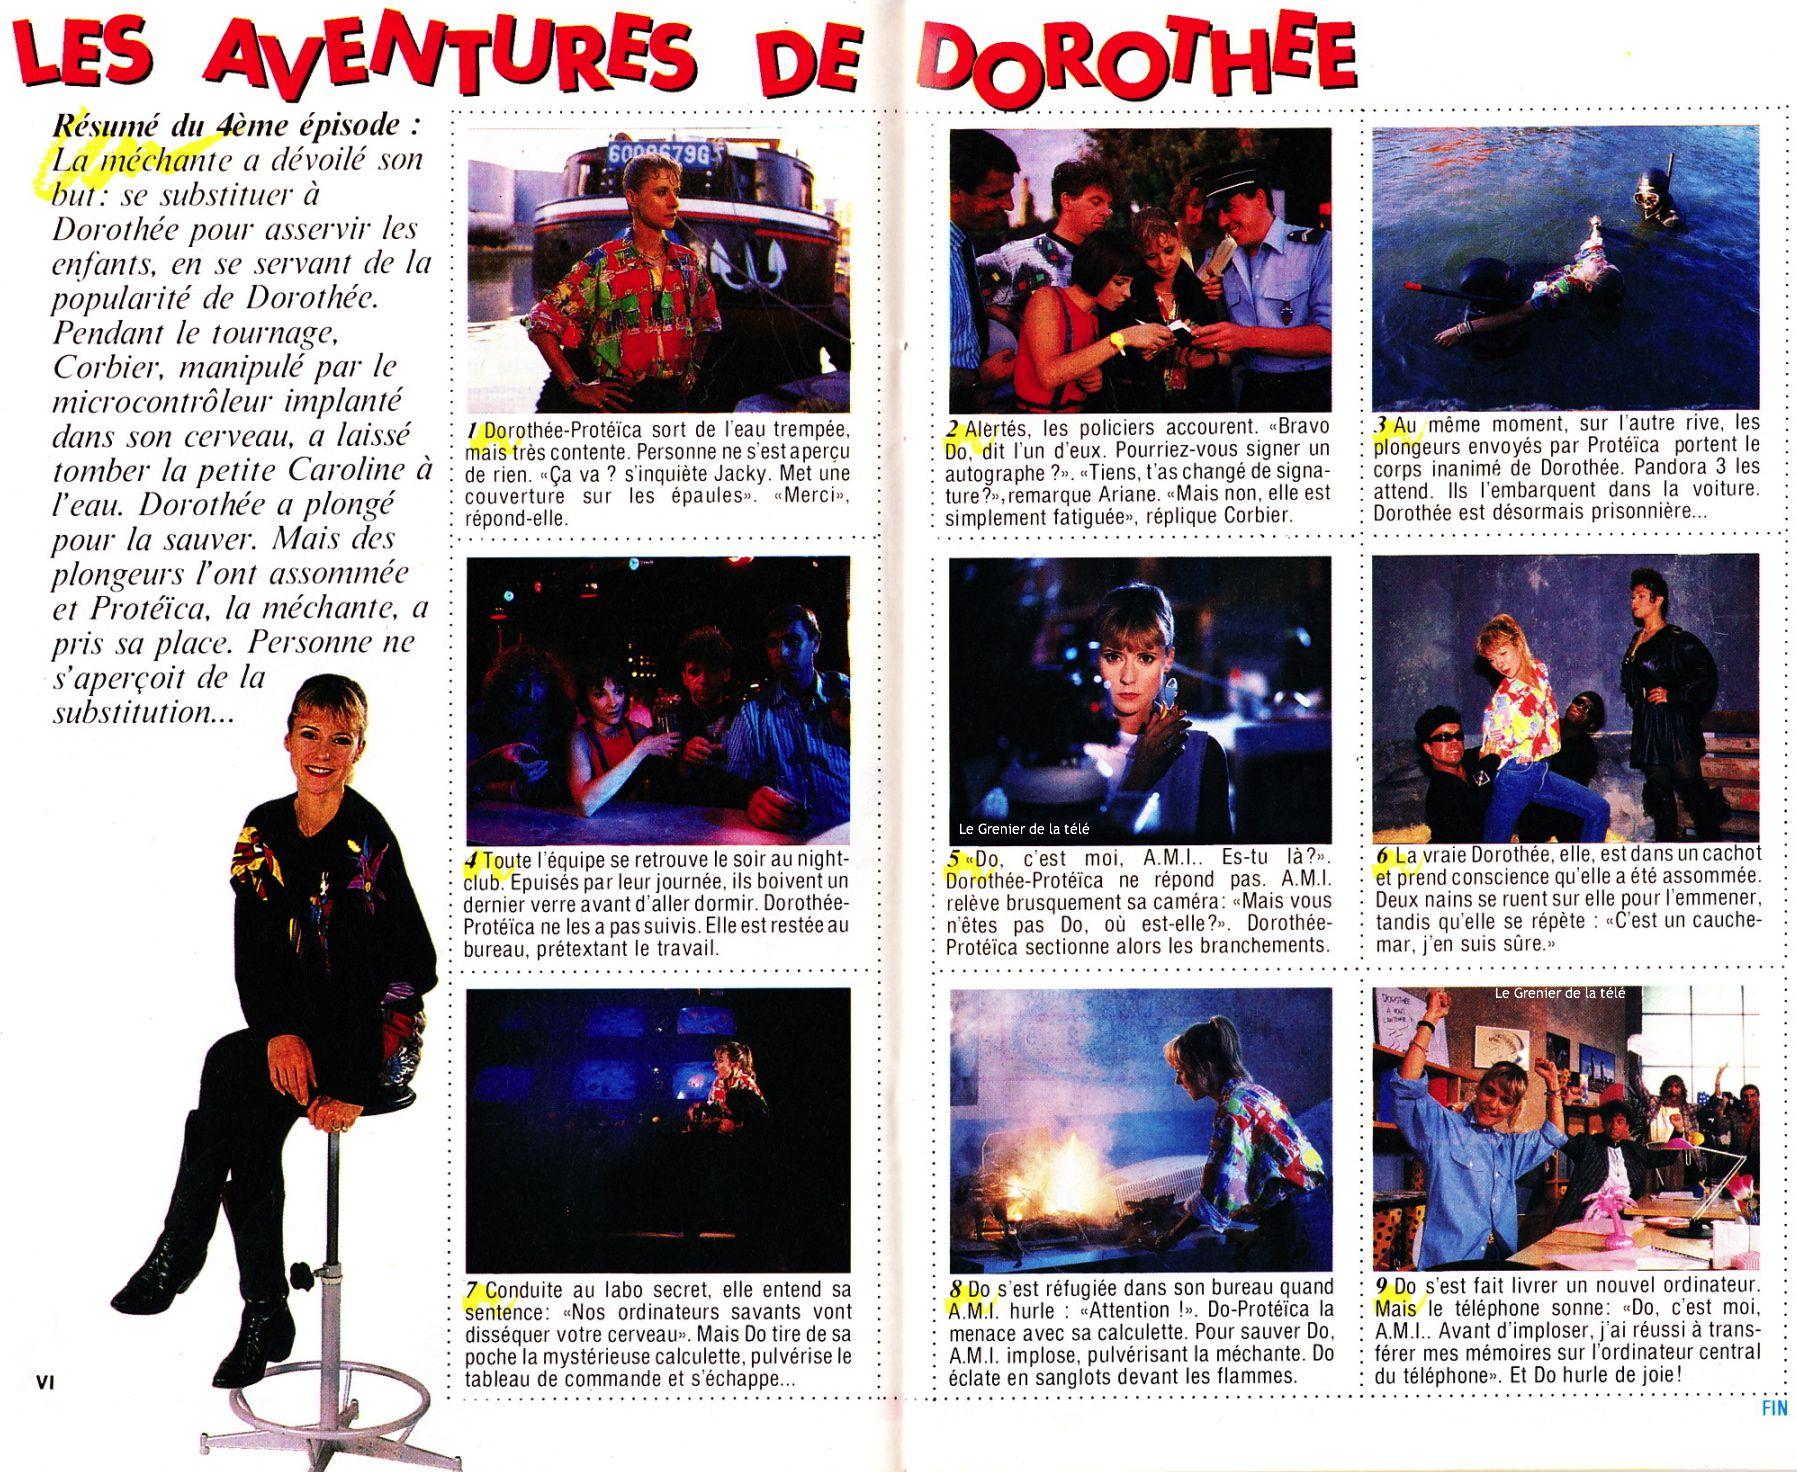 http://grenierdelatv.free.fr/2/pochejunior24oct198704.jpg